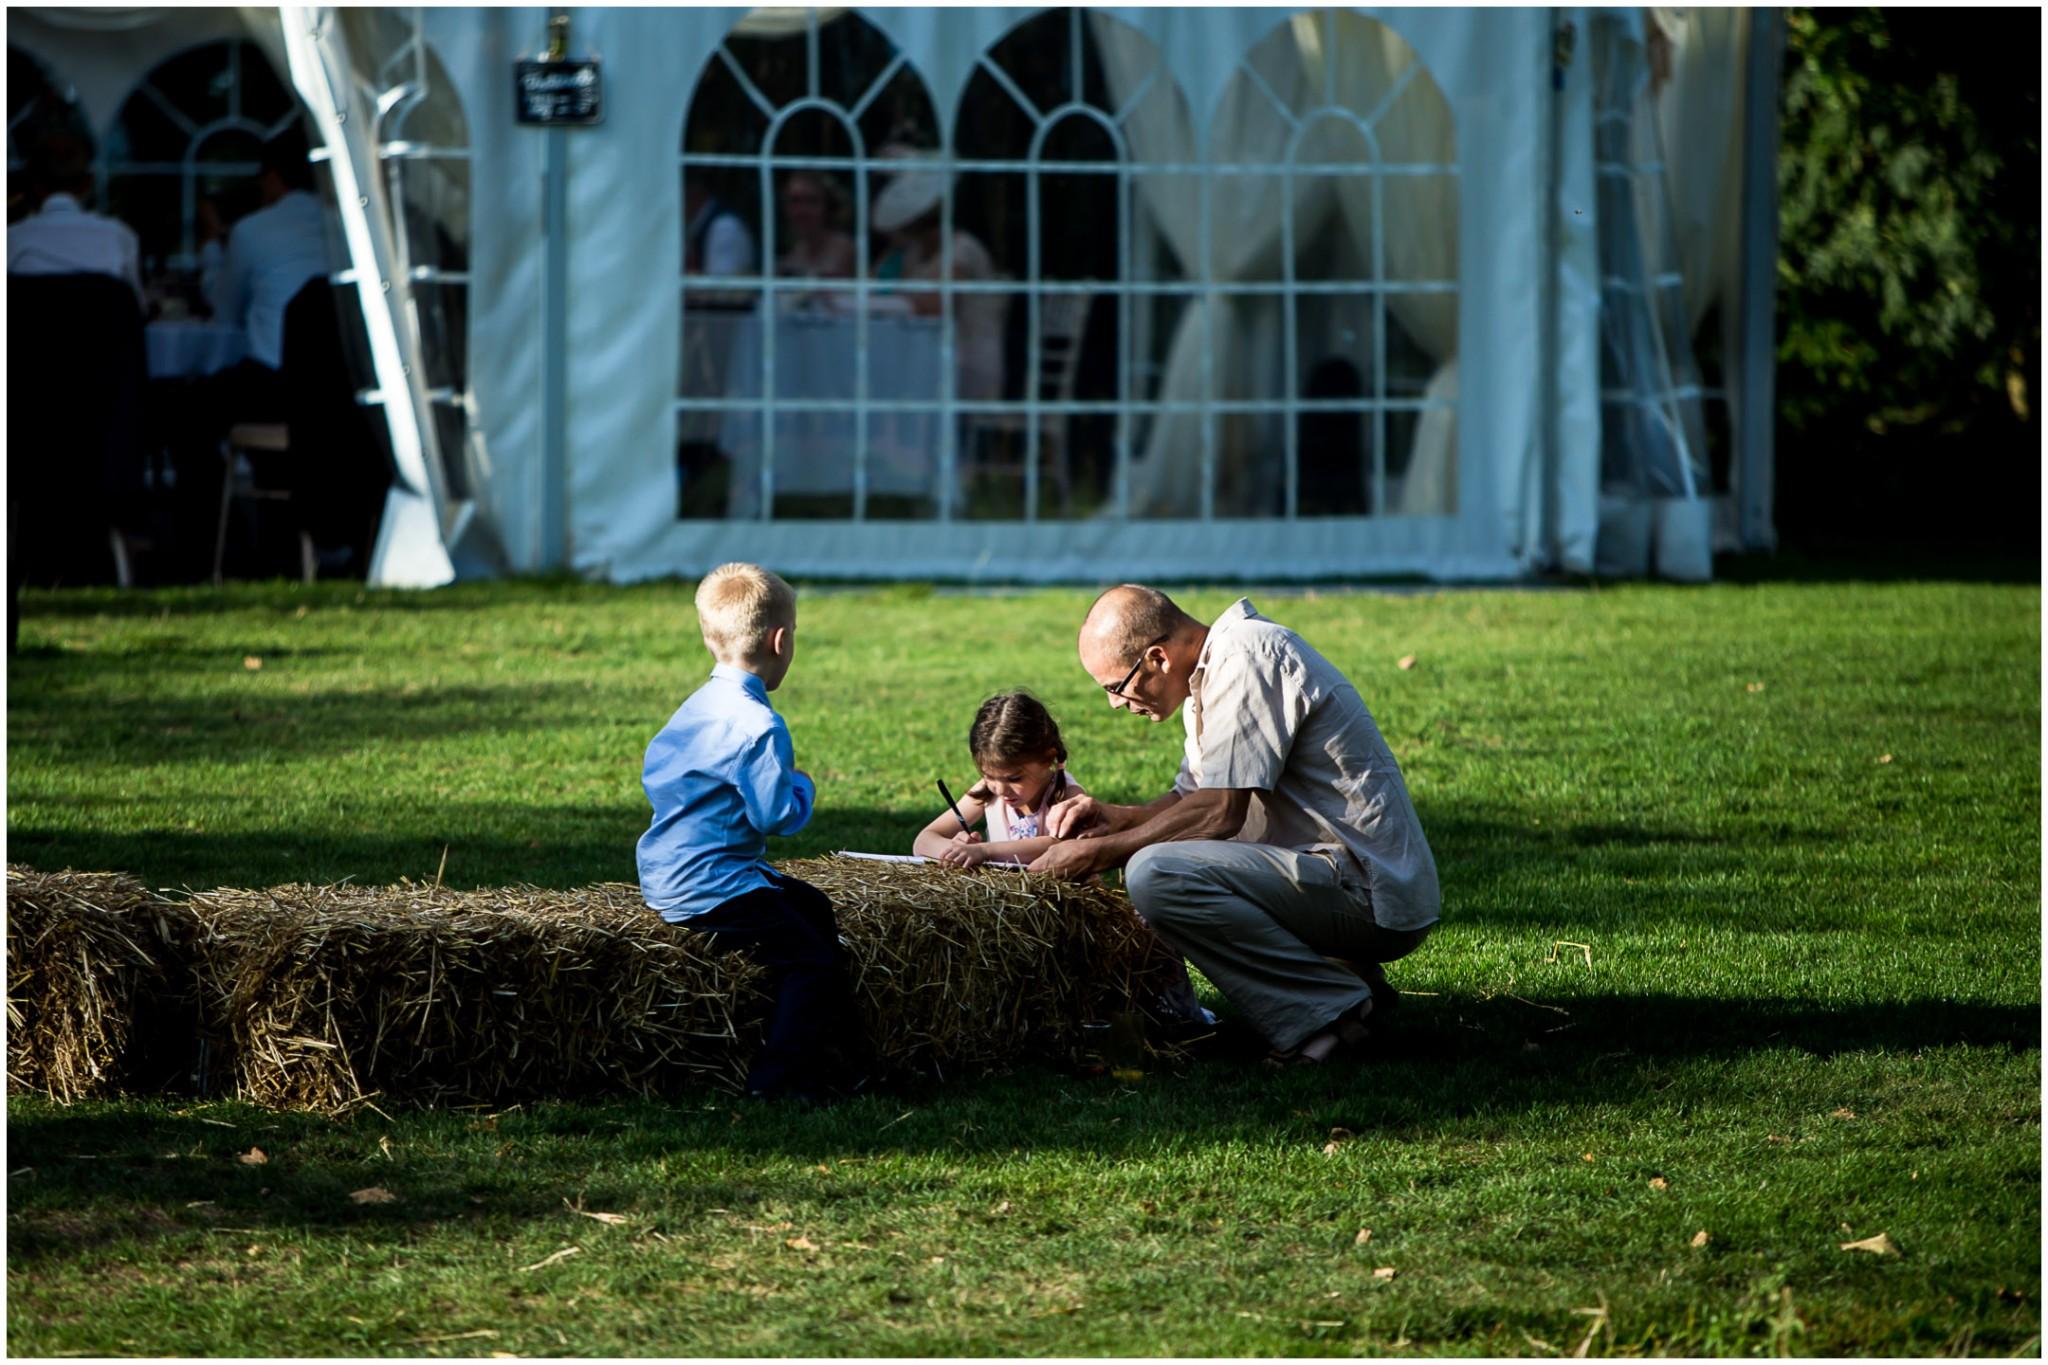 Tournerbury Woods Estate Wedding Children playing